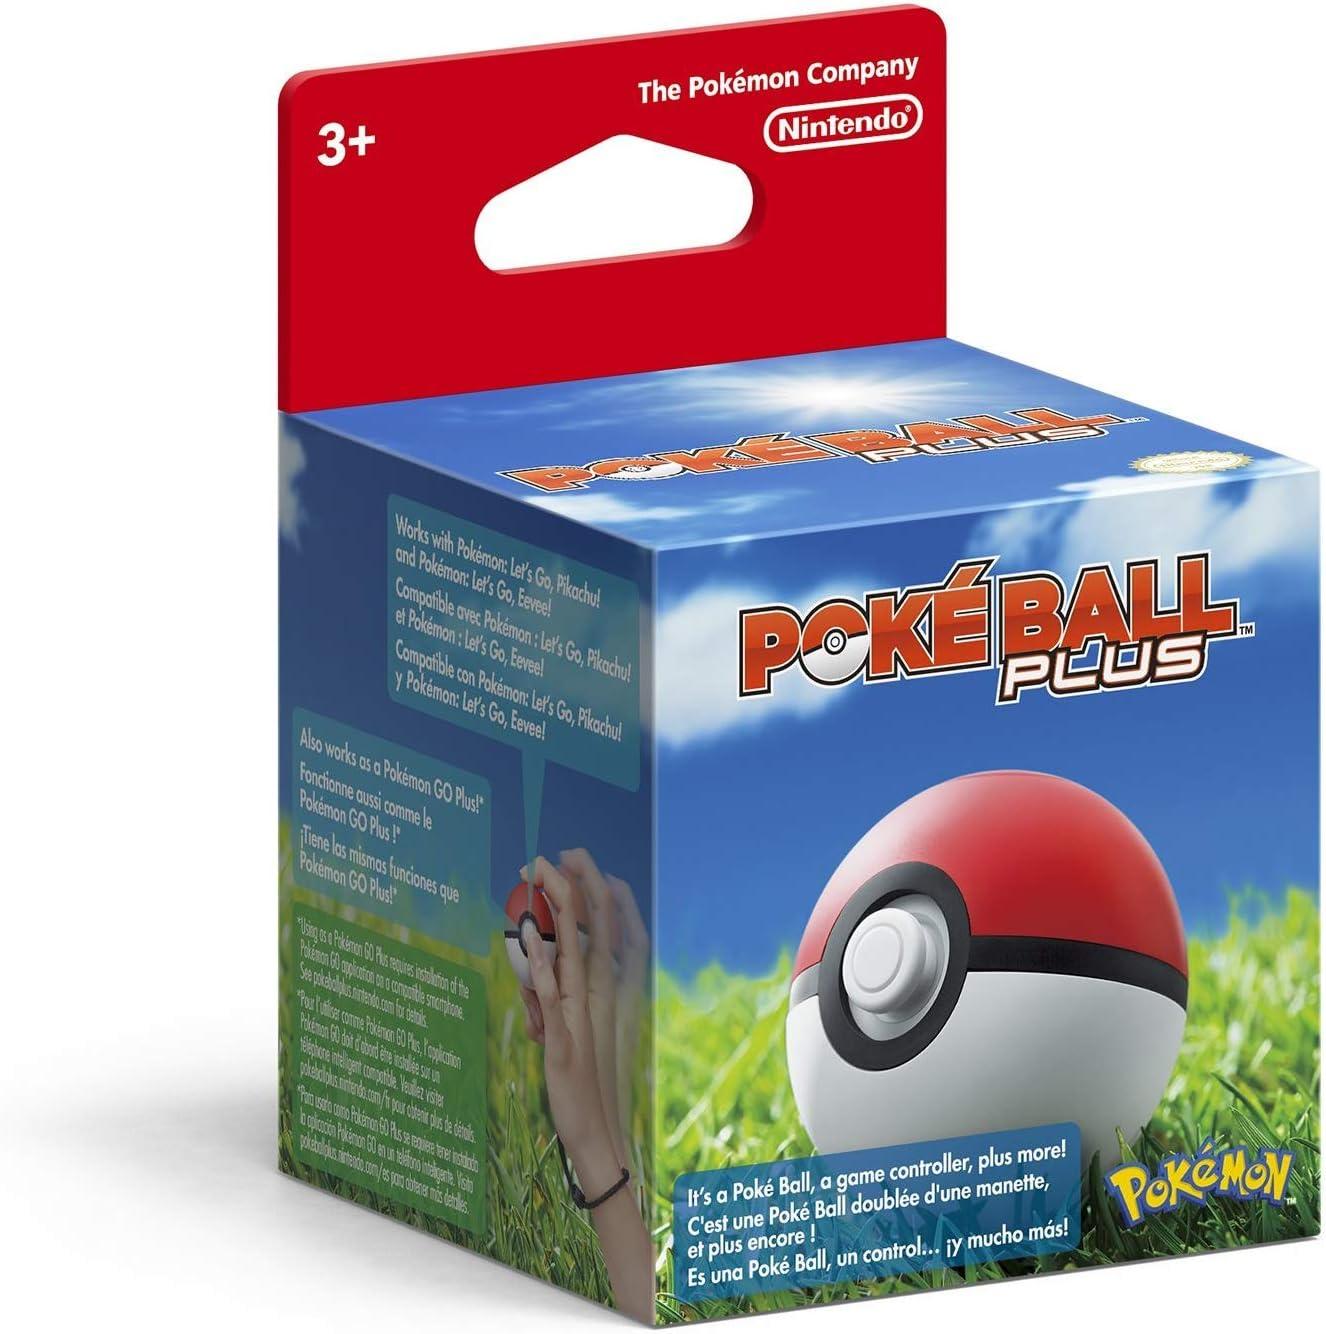 Nintendo Pokemon Poke Ball Plus